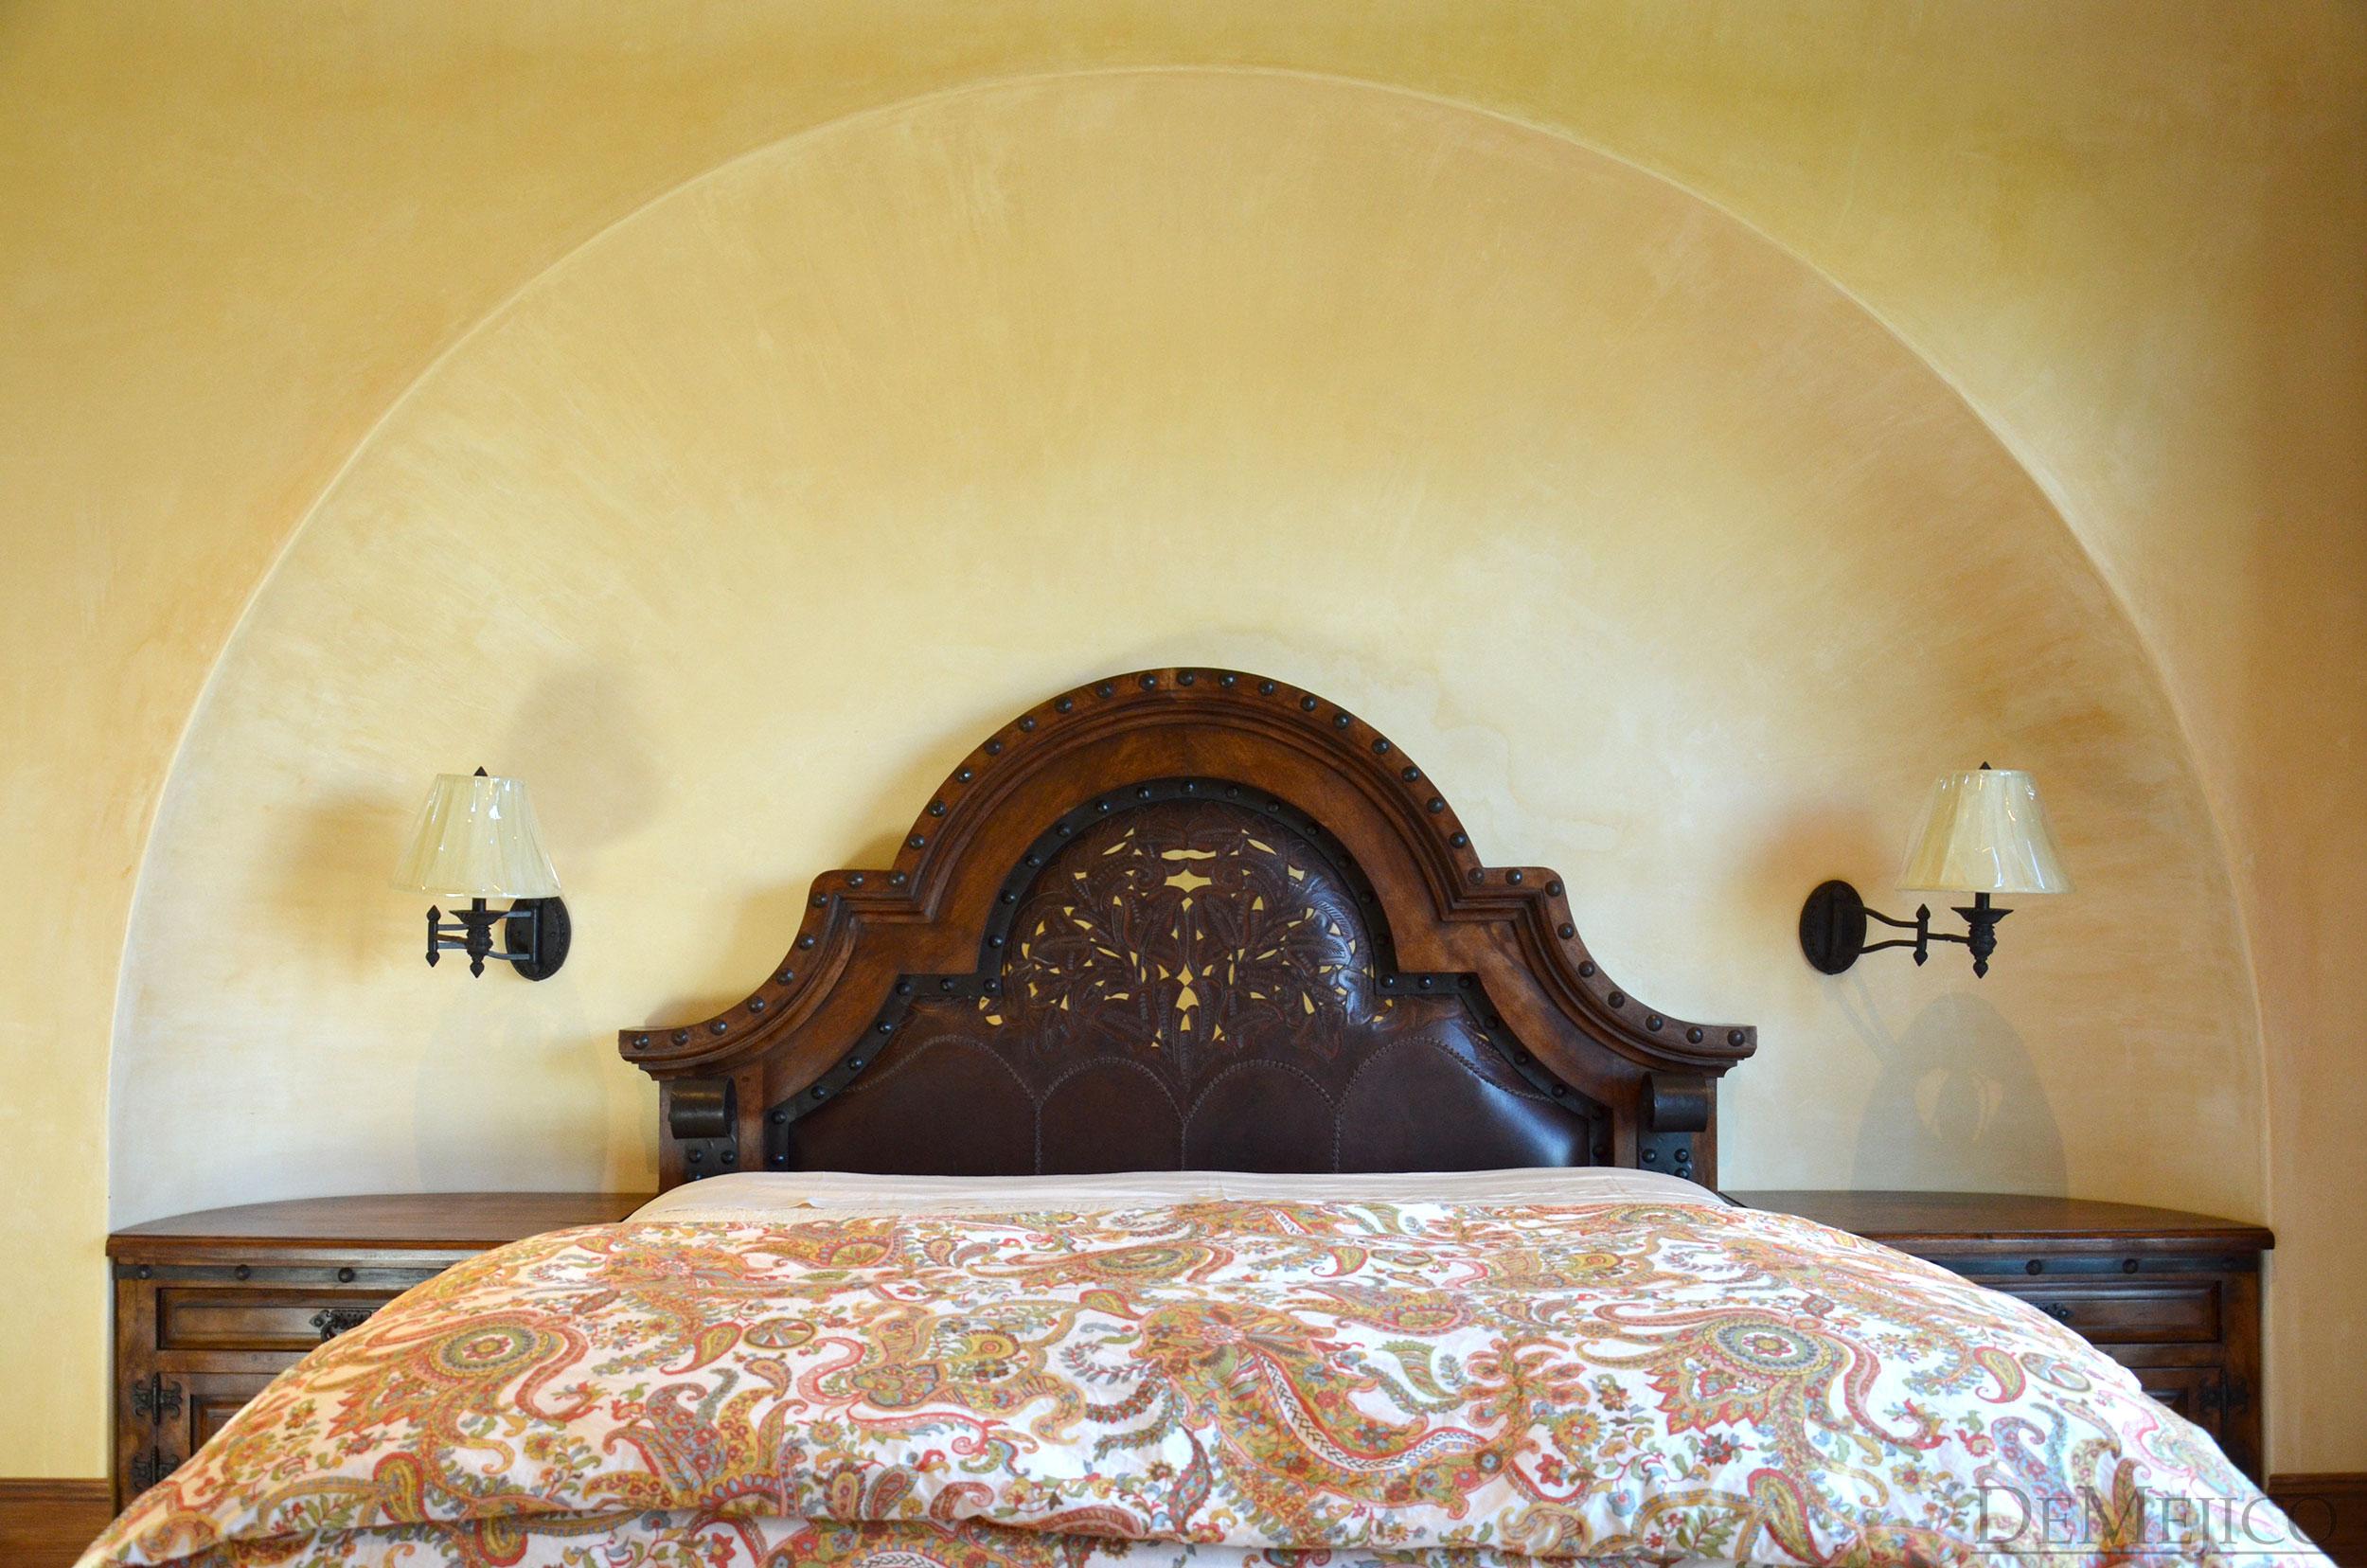 spanish bedroom rustic bedroom rustic dining room spanish style home spanish dining room